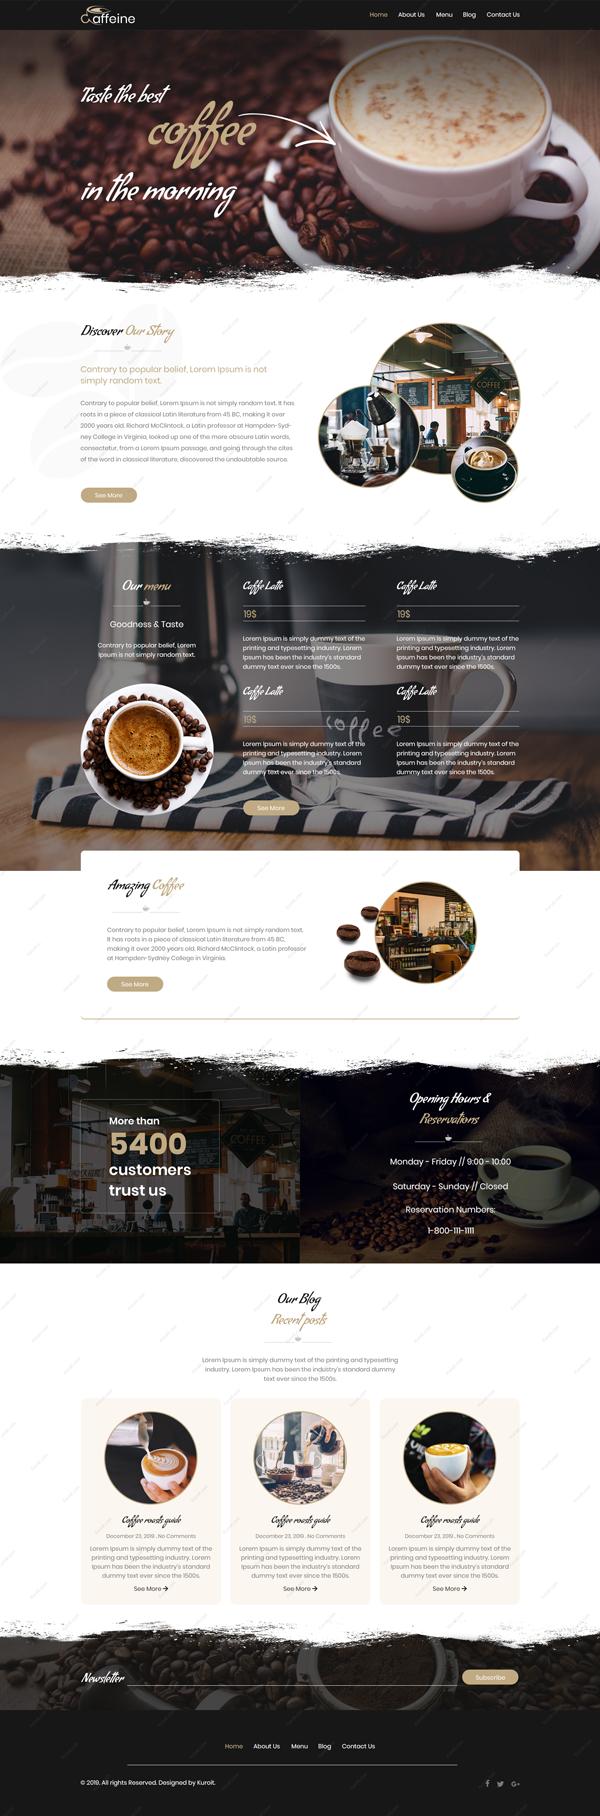 Caffeine-Website-Design